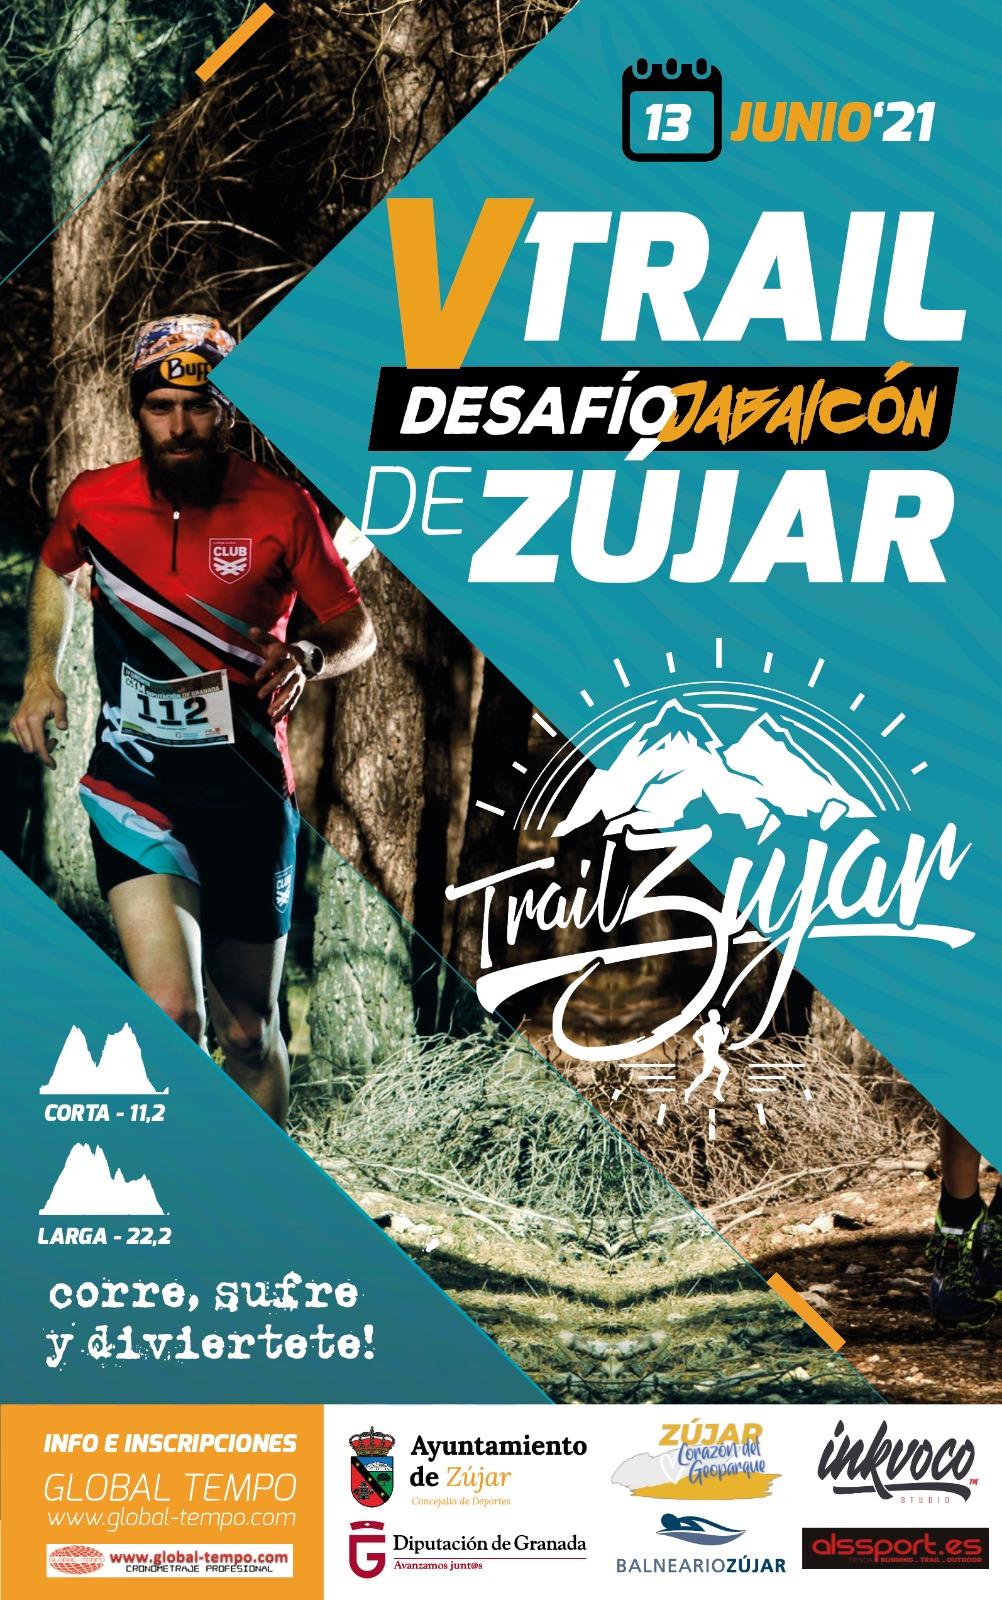 V Trail de Zújar Desafío Jabalcón